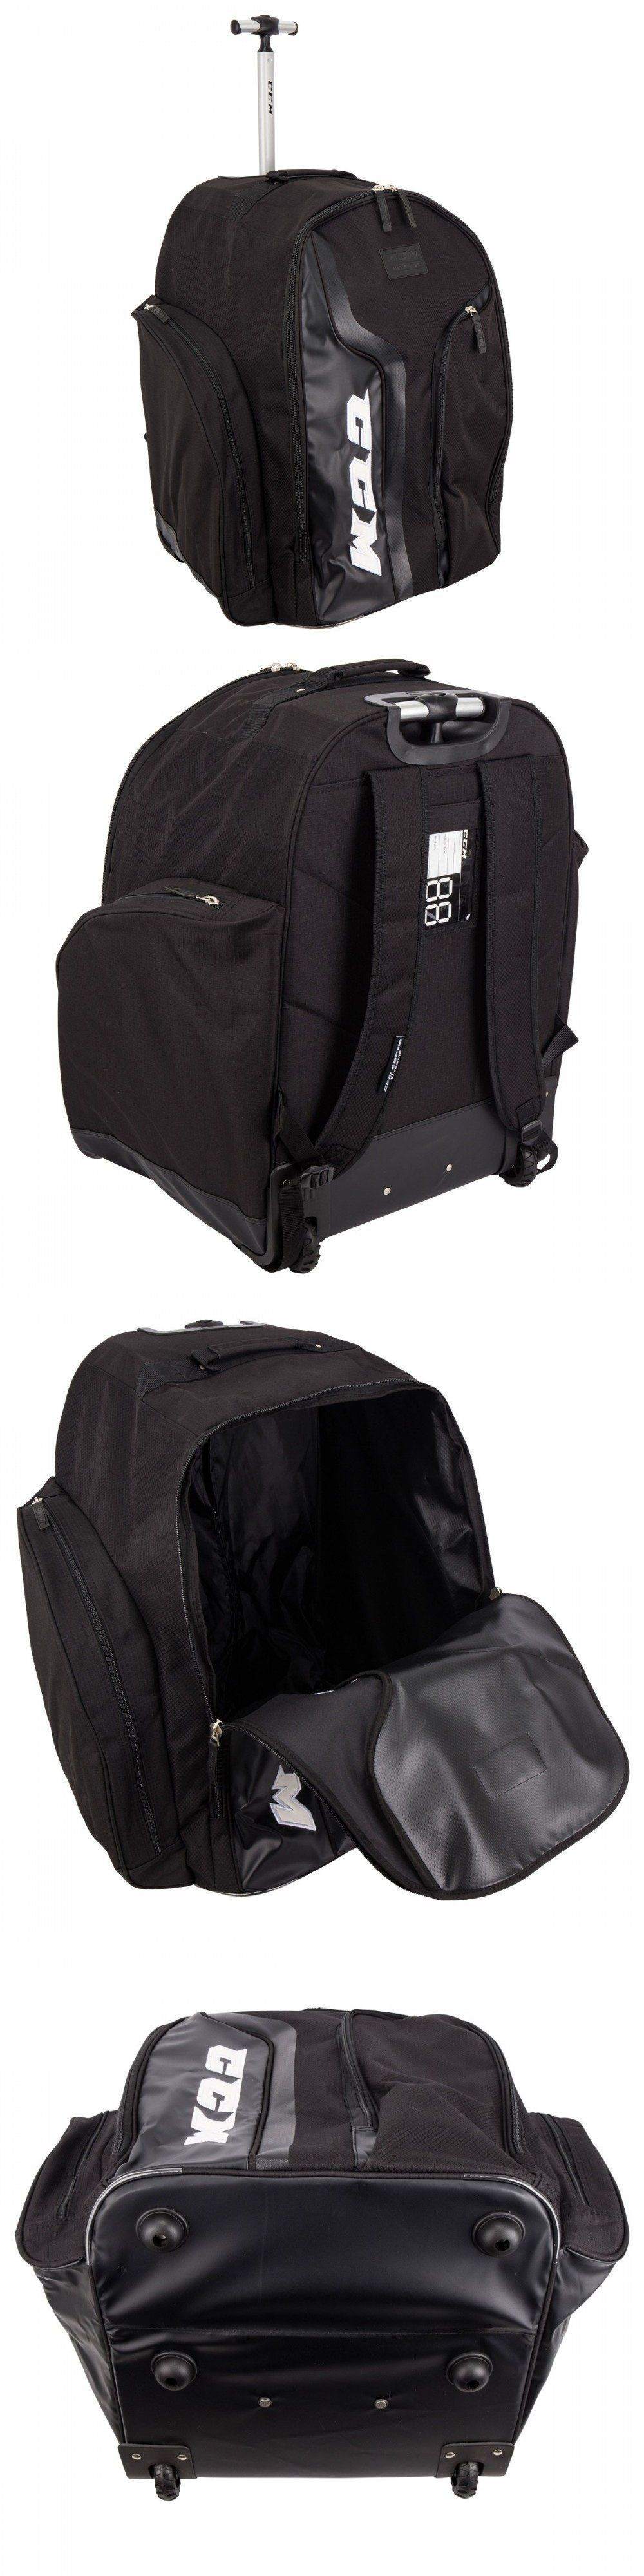 89e4c3784d3 Equipment Bags 58113  New Ccm 290 18 Wheeled Hockey Equipment Backpack  Travel Bag Black -  BUY IT NOW ONLY   84.95 on  eBay  equipment  wheeled   hockey ...